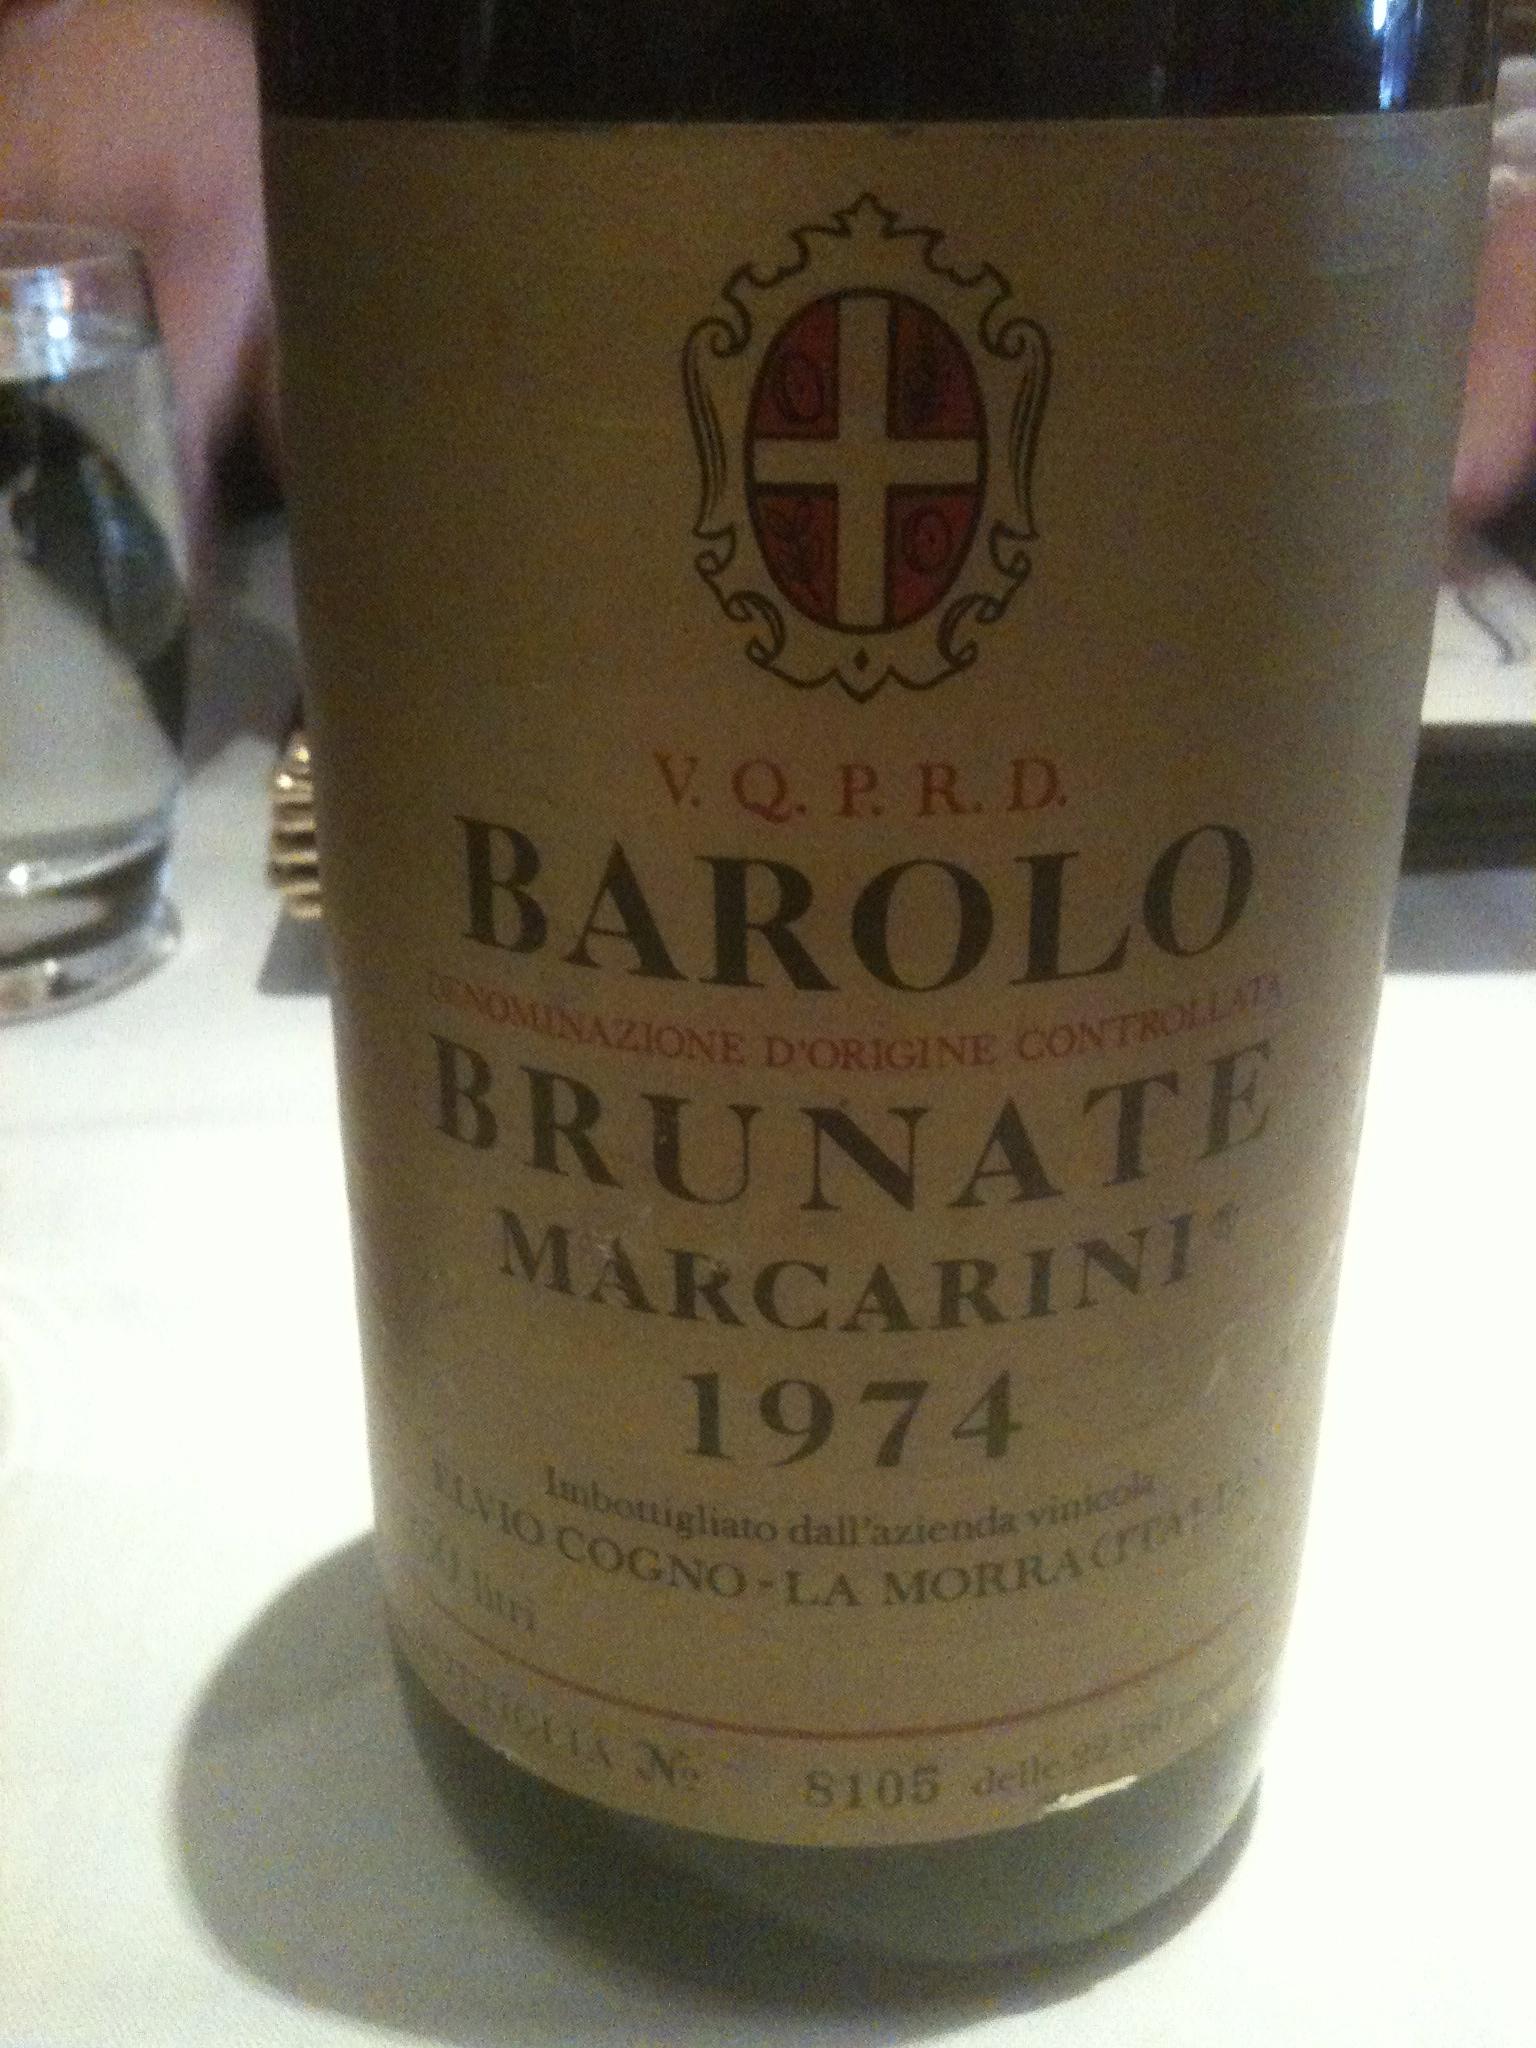 "Barolo Brunate Marcarini Marcarini Barolo ""brunate"""